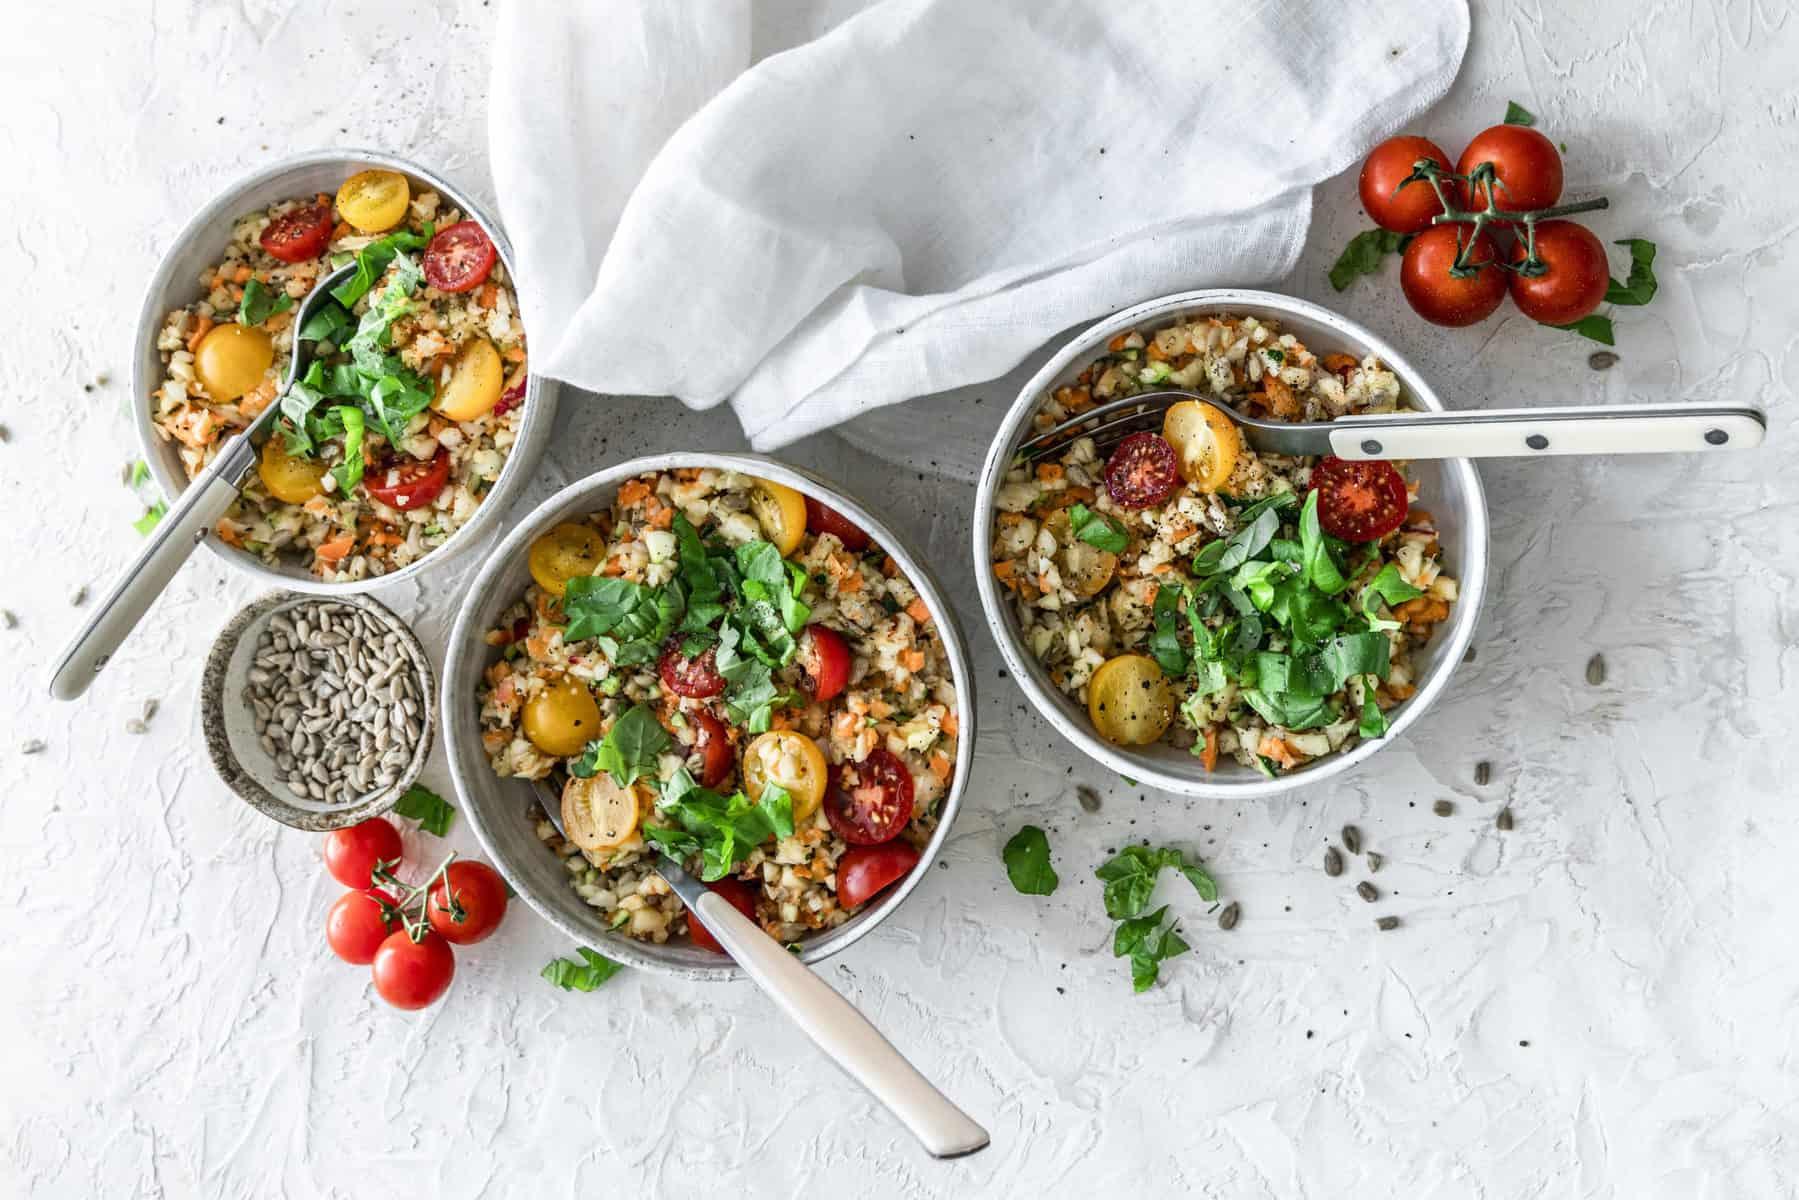 Ratz-Fatz-Gemüsesalat mit dem Thermomix® –Foto: Tina Bumann